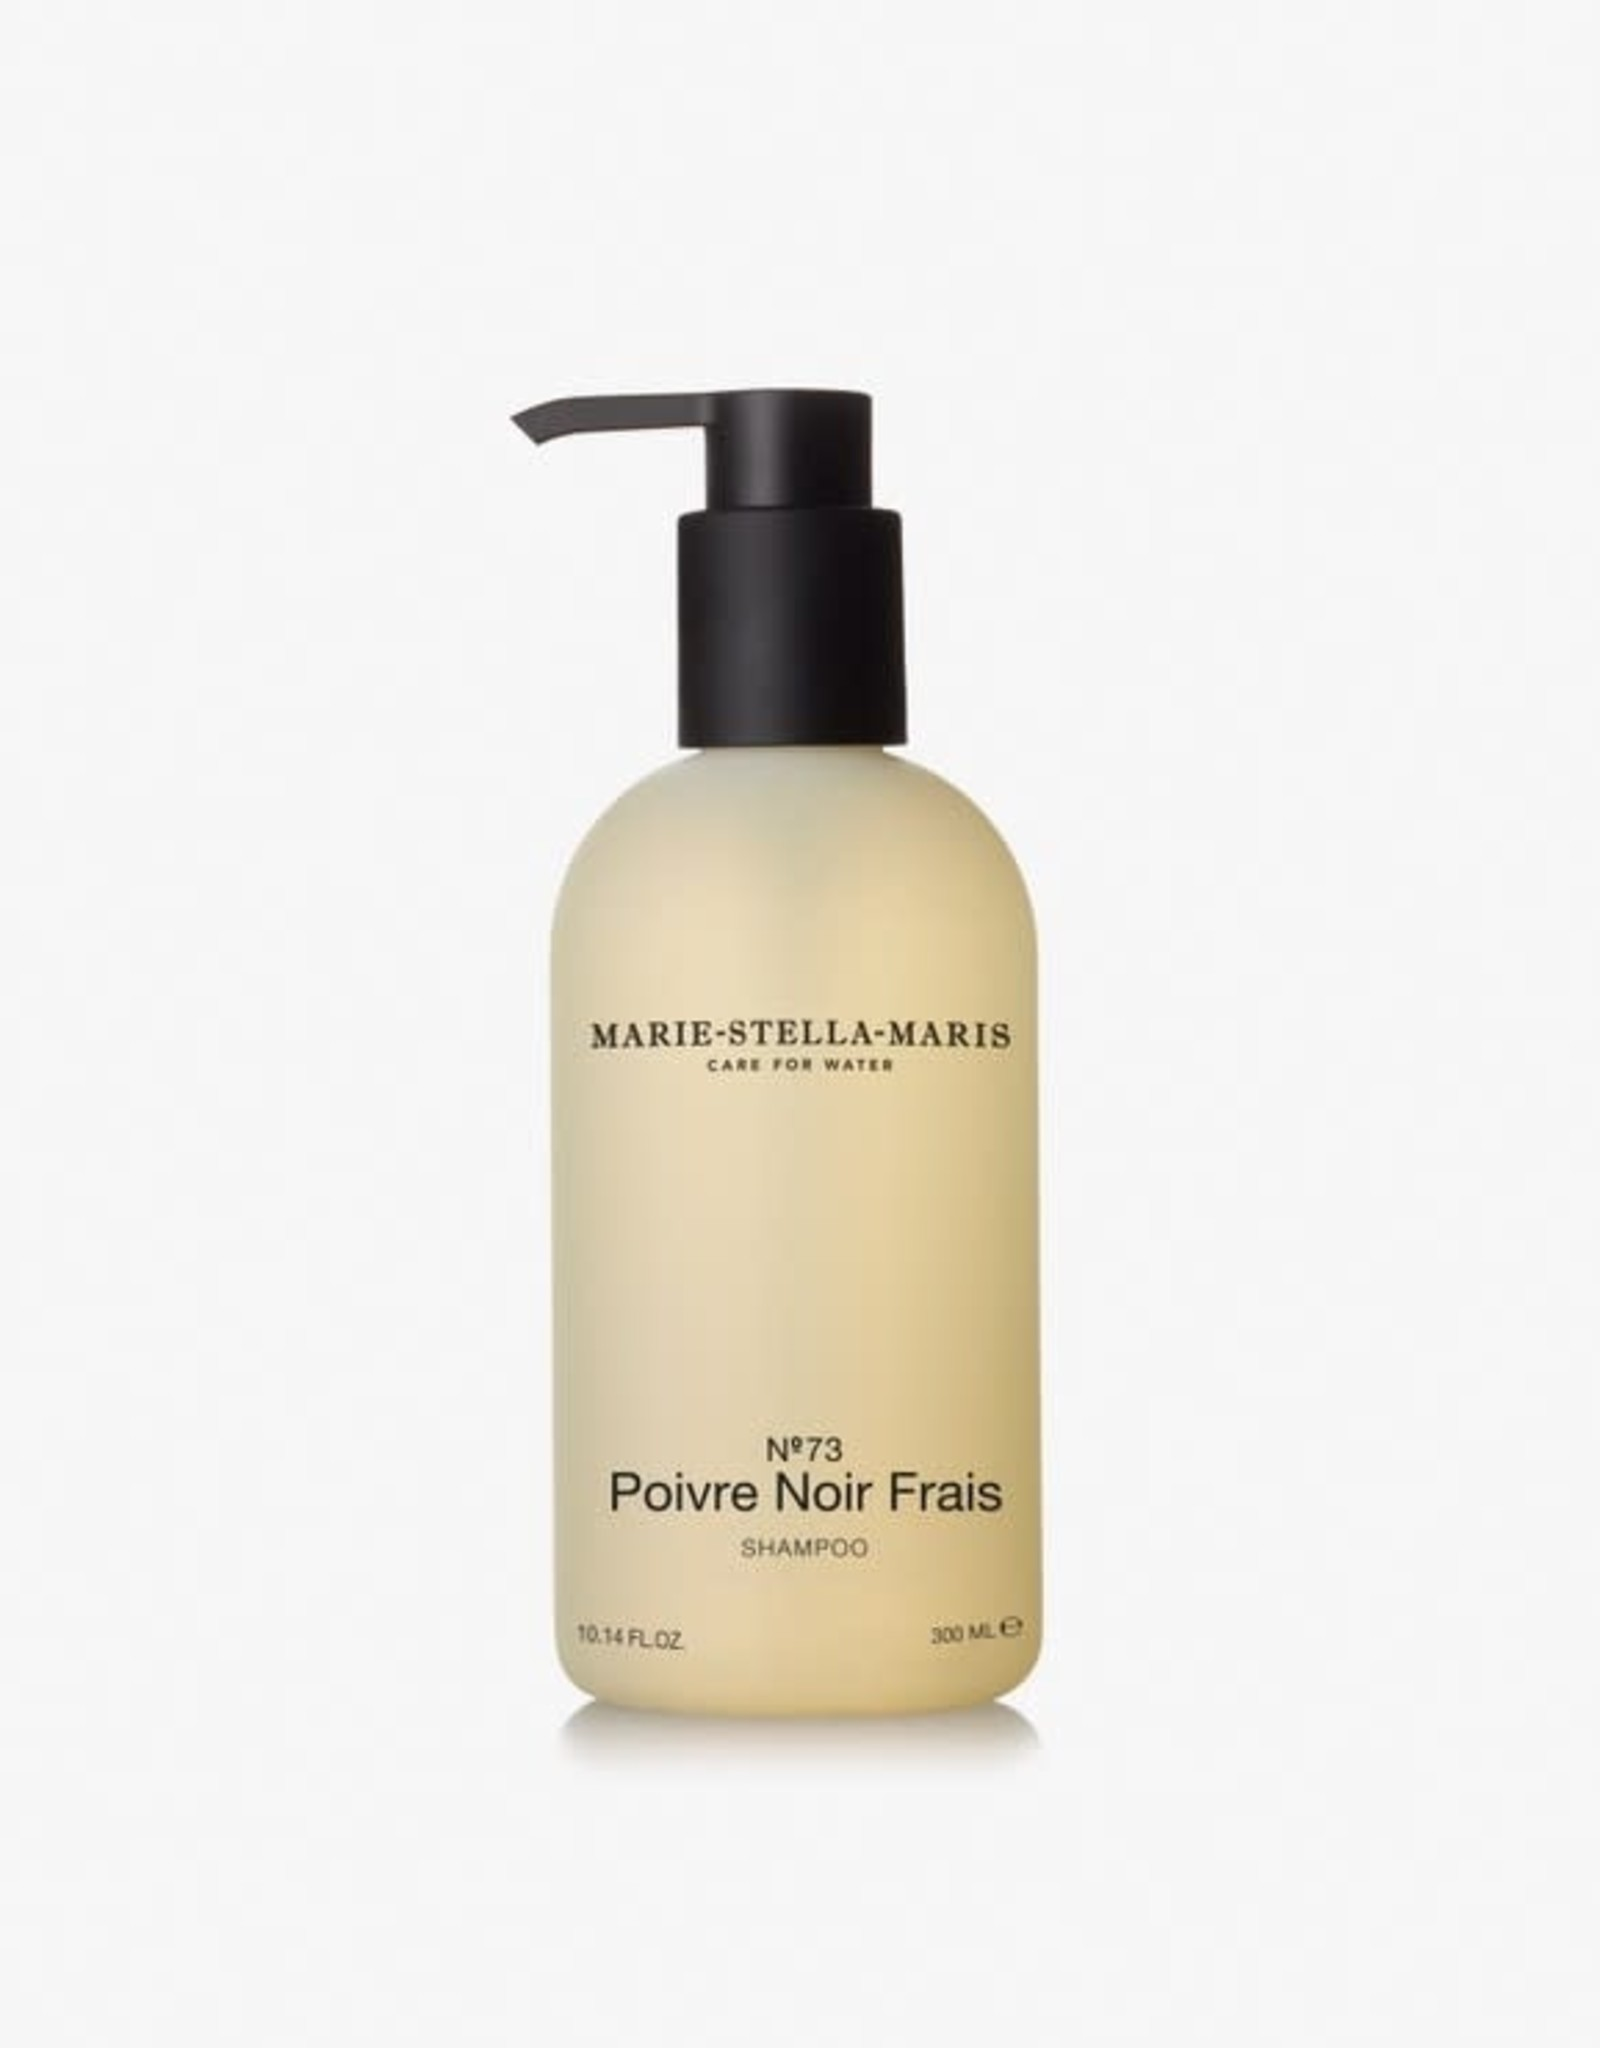 Marie-Stella-Maris Shampoo Poivre Noir Frais 300ml